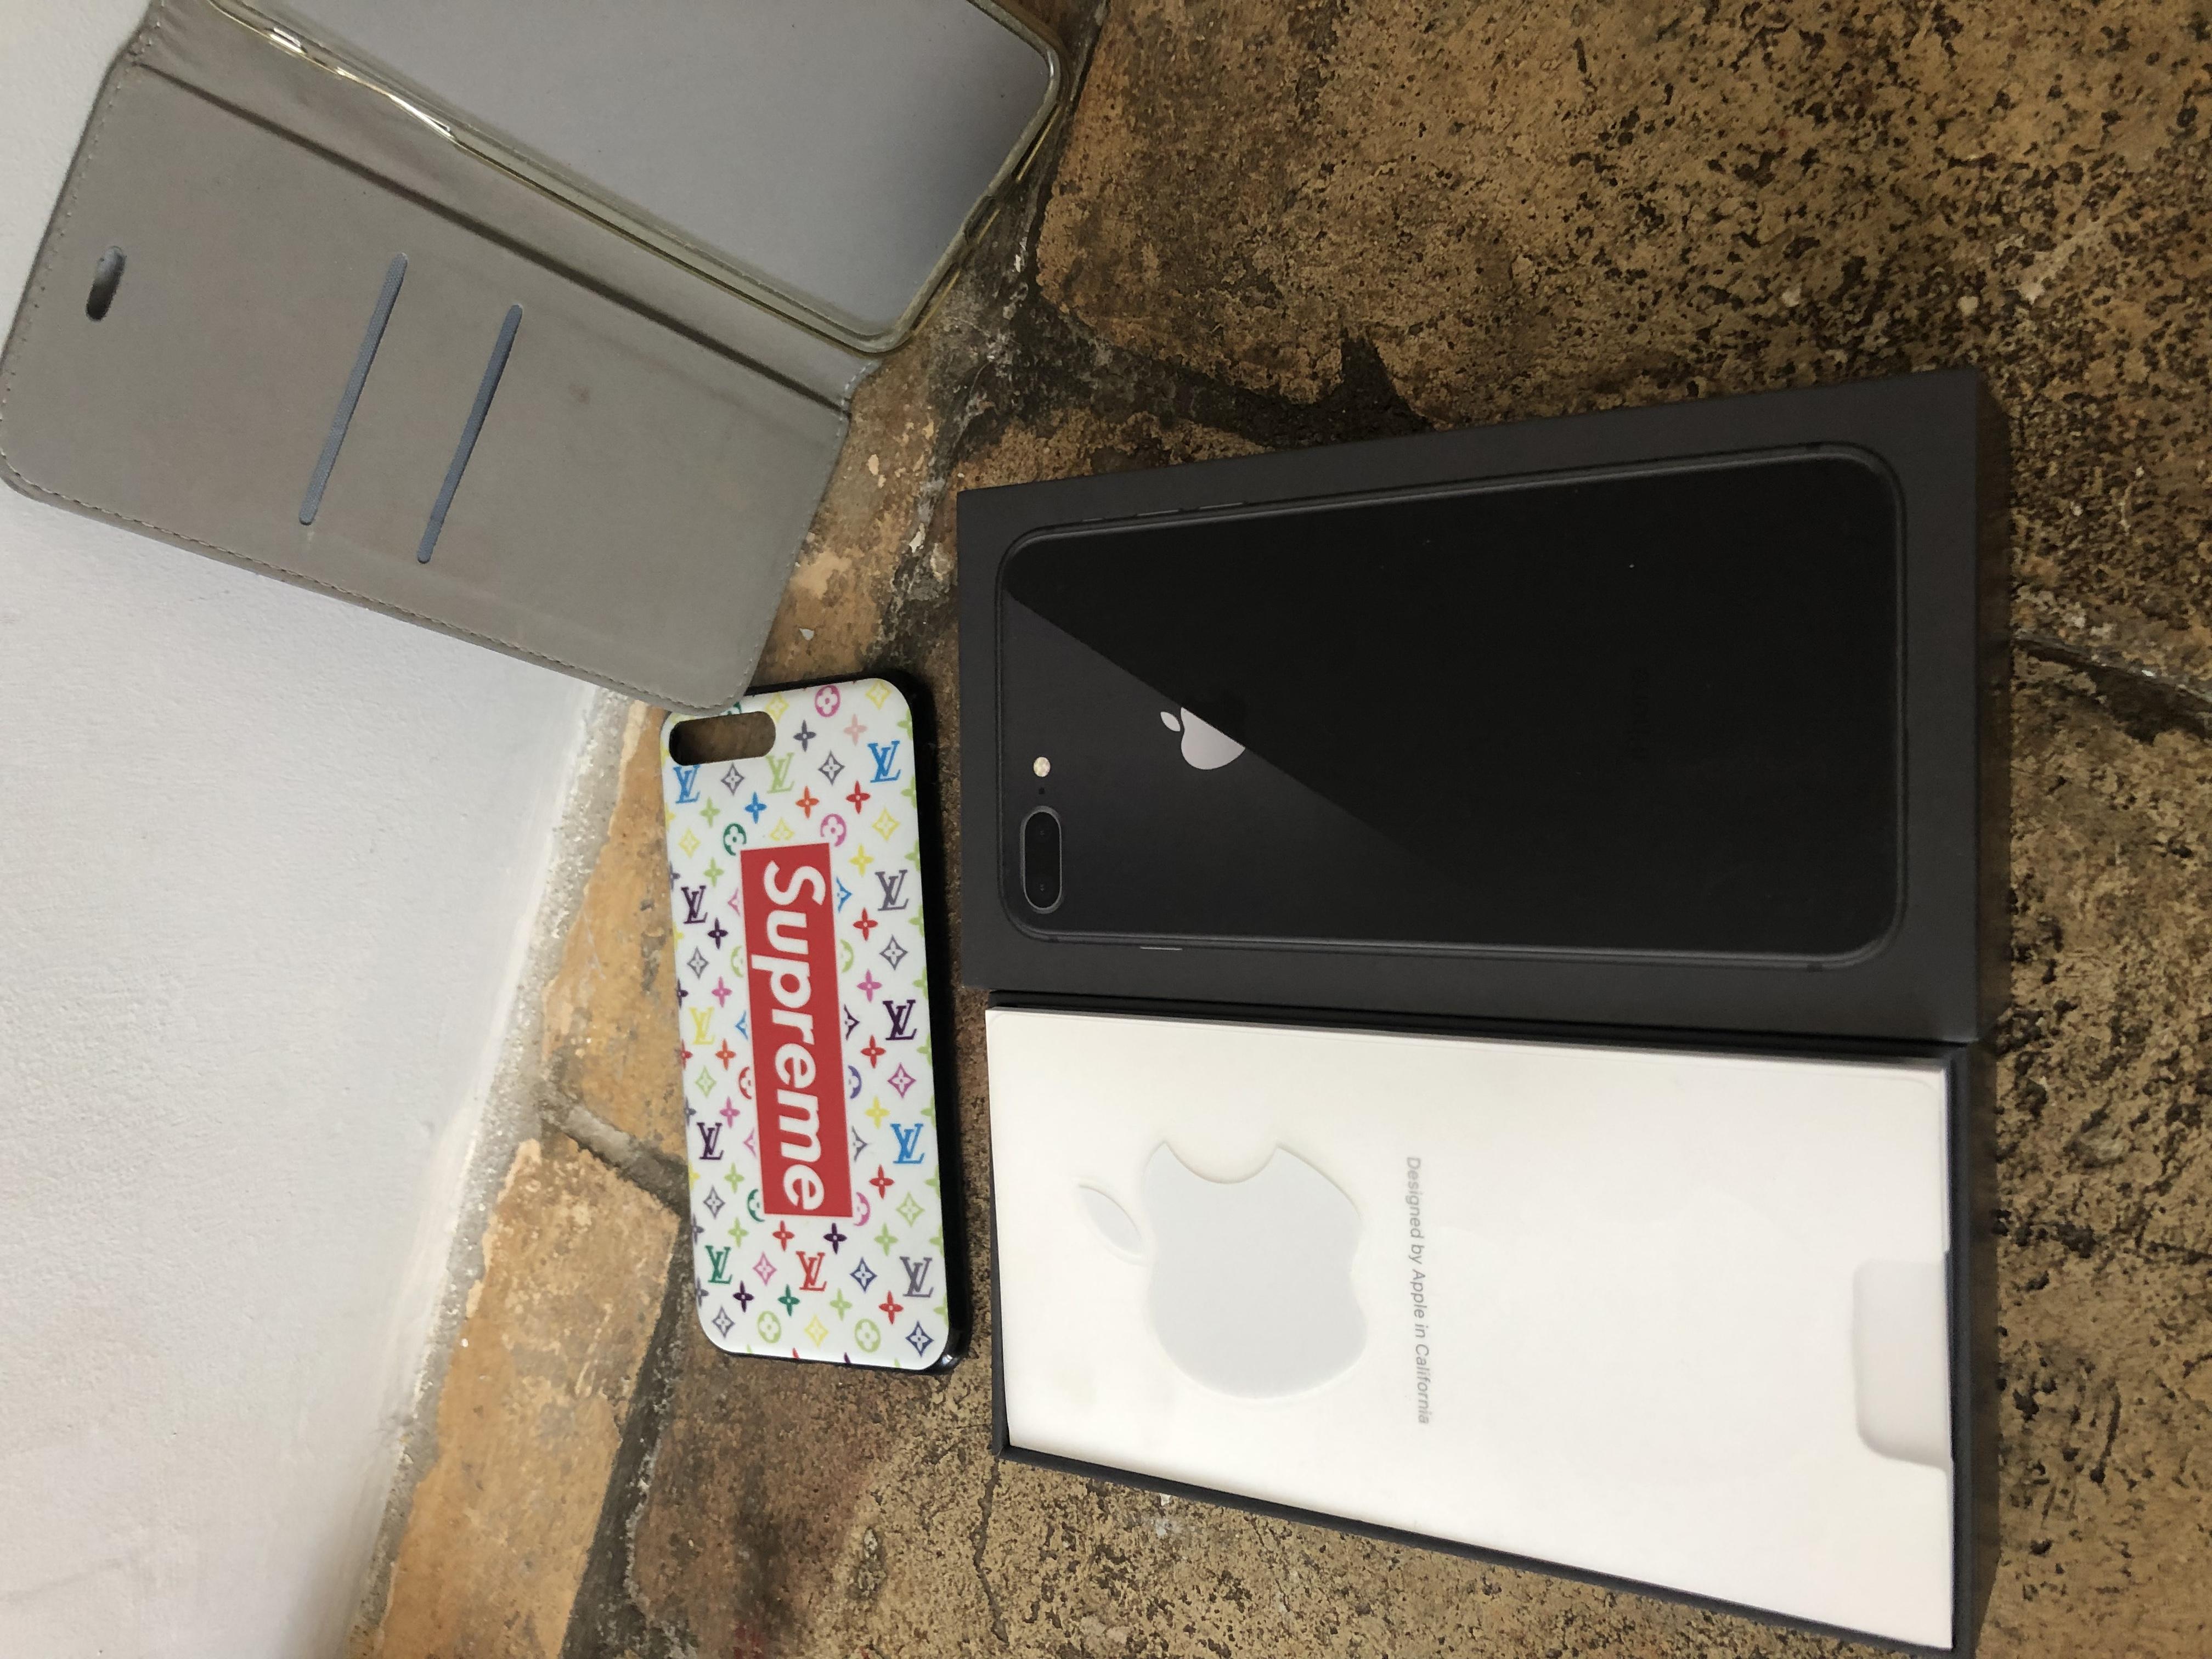 iPhone 8 Plus 64 gb comme neuf